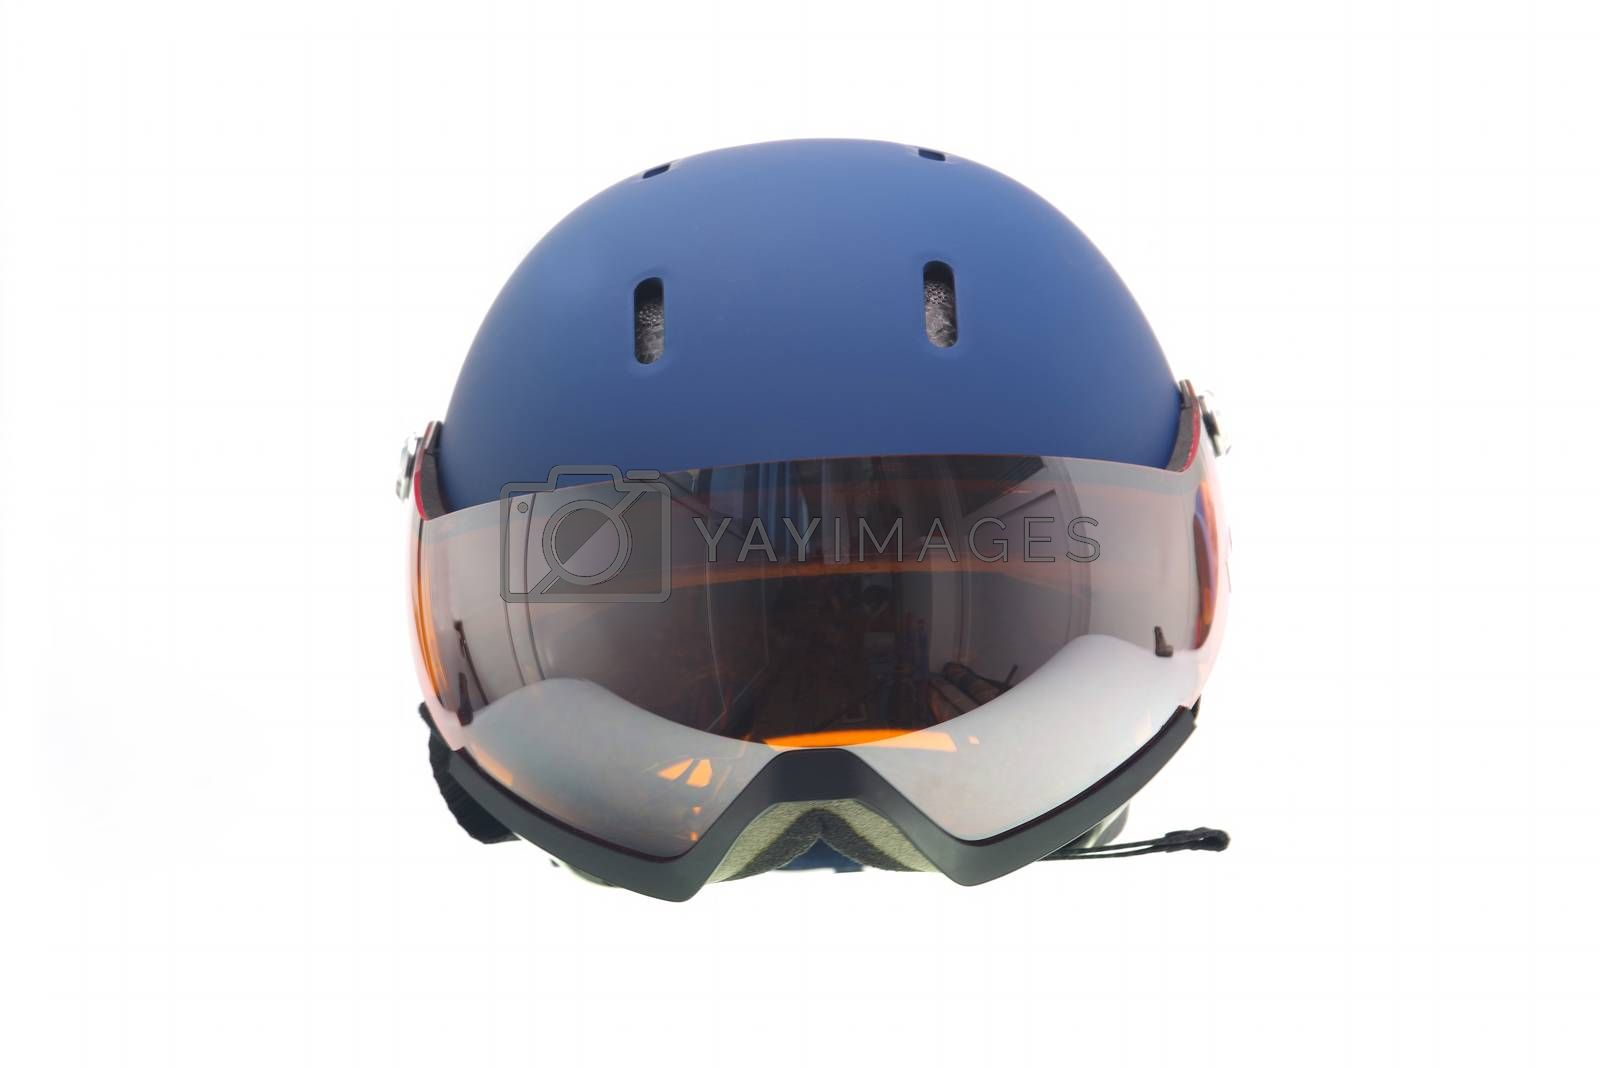 Protective blue ski helmet with snow glasses.